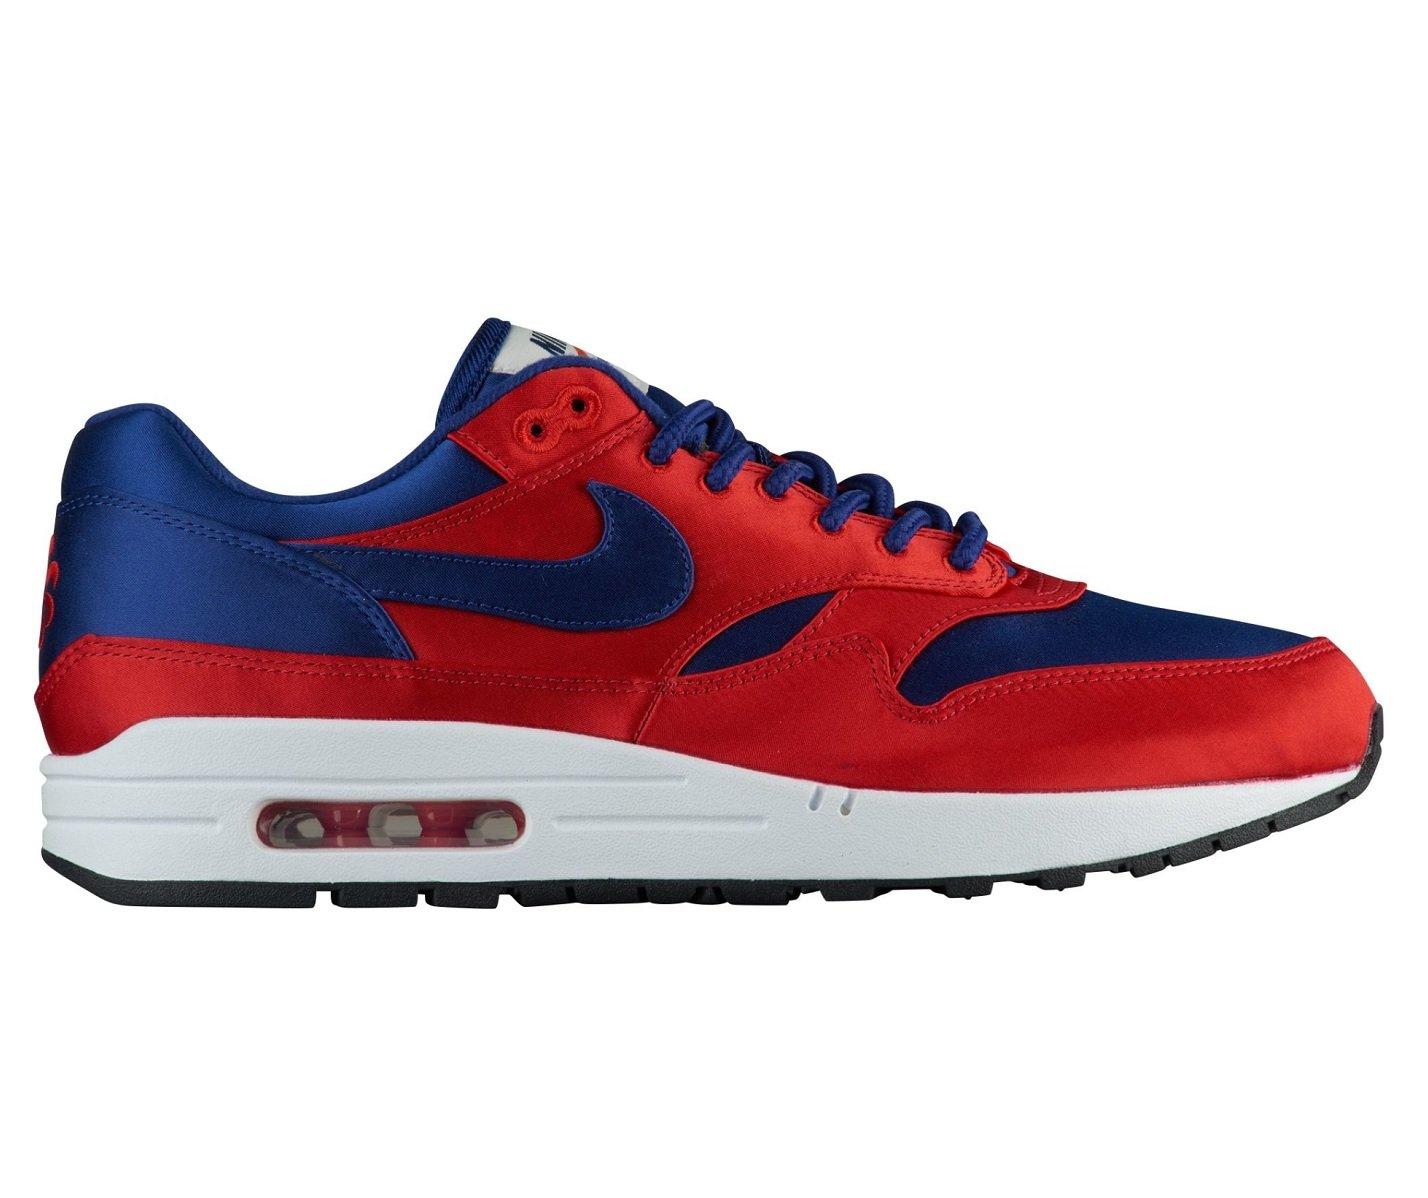 Nike - Ao1021-600 Hombre 6 D(M) US|University Red/Deep Royal Blue-white